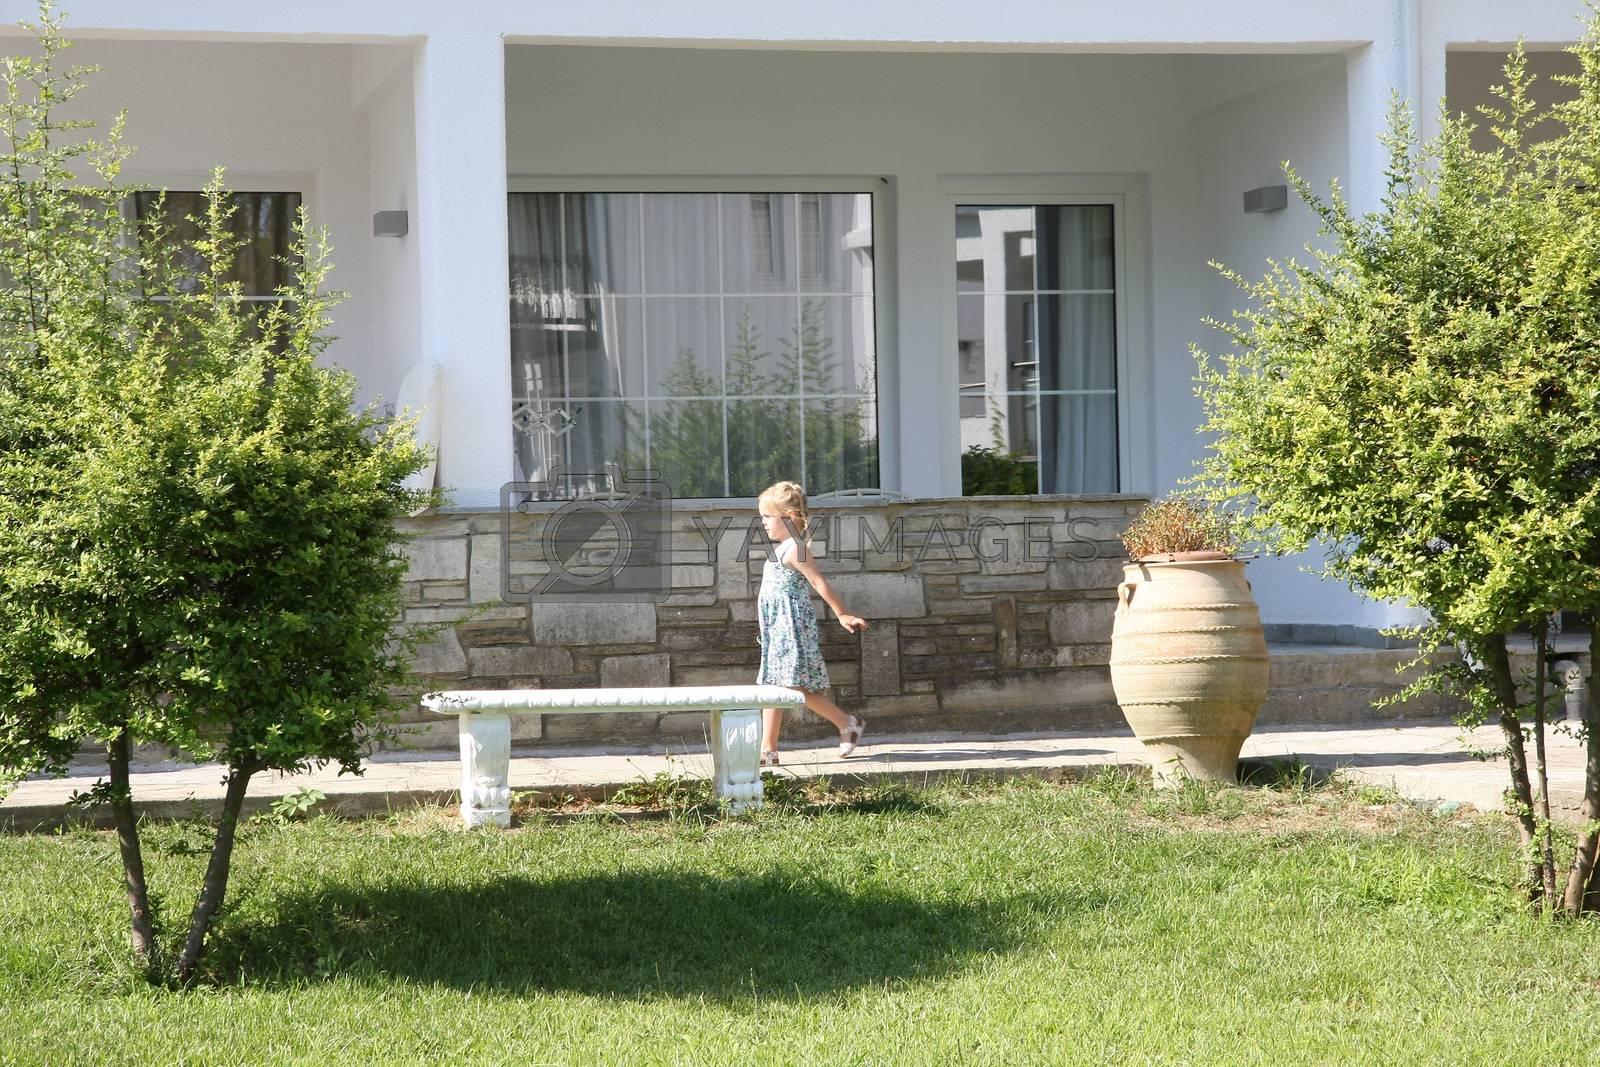 Cute baby girl proudly walking in resort